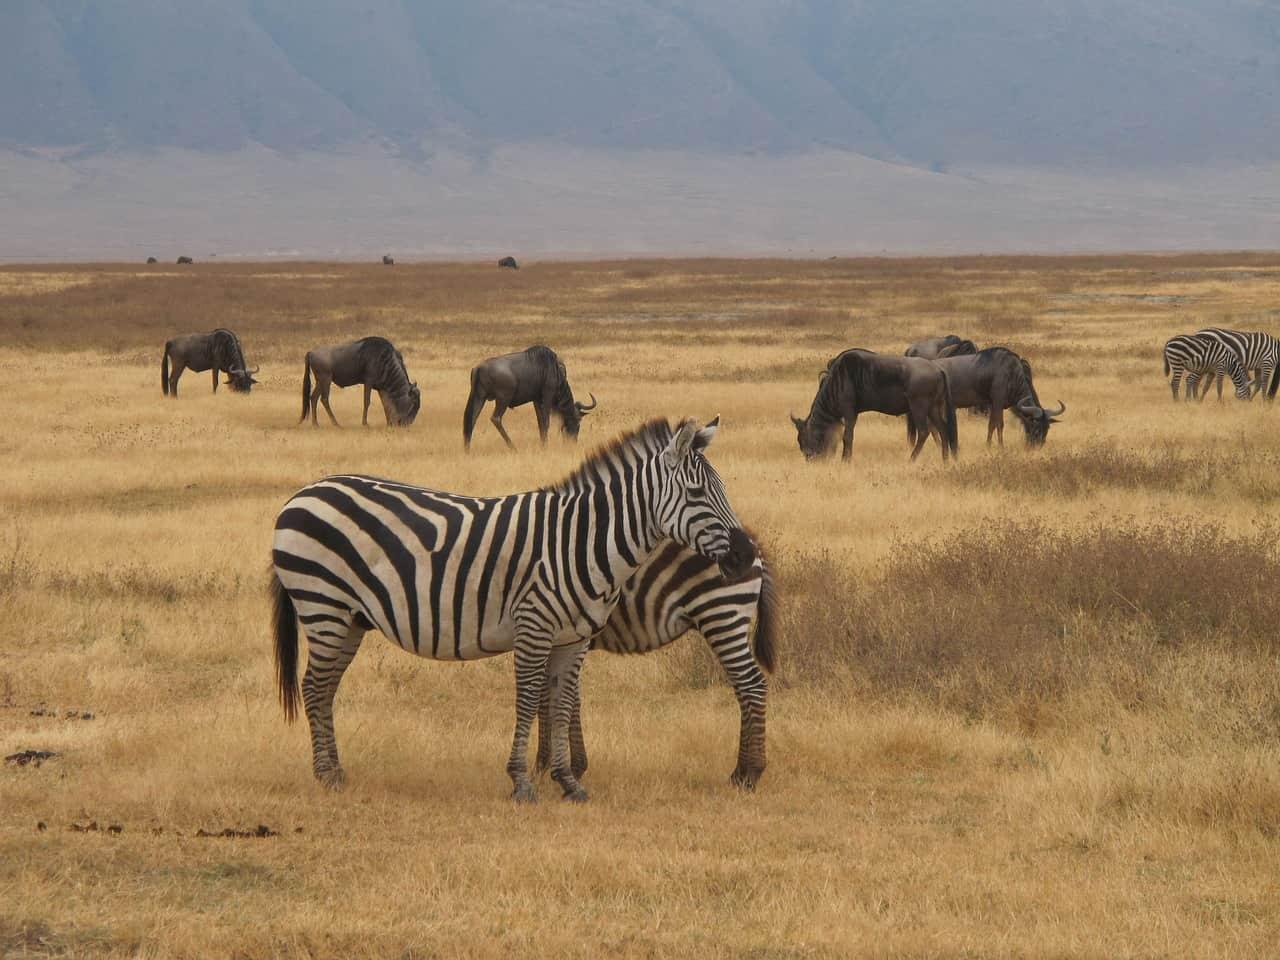 Zebra Safari 2284147 1280 Copy